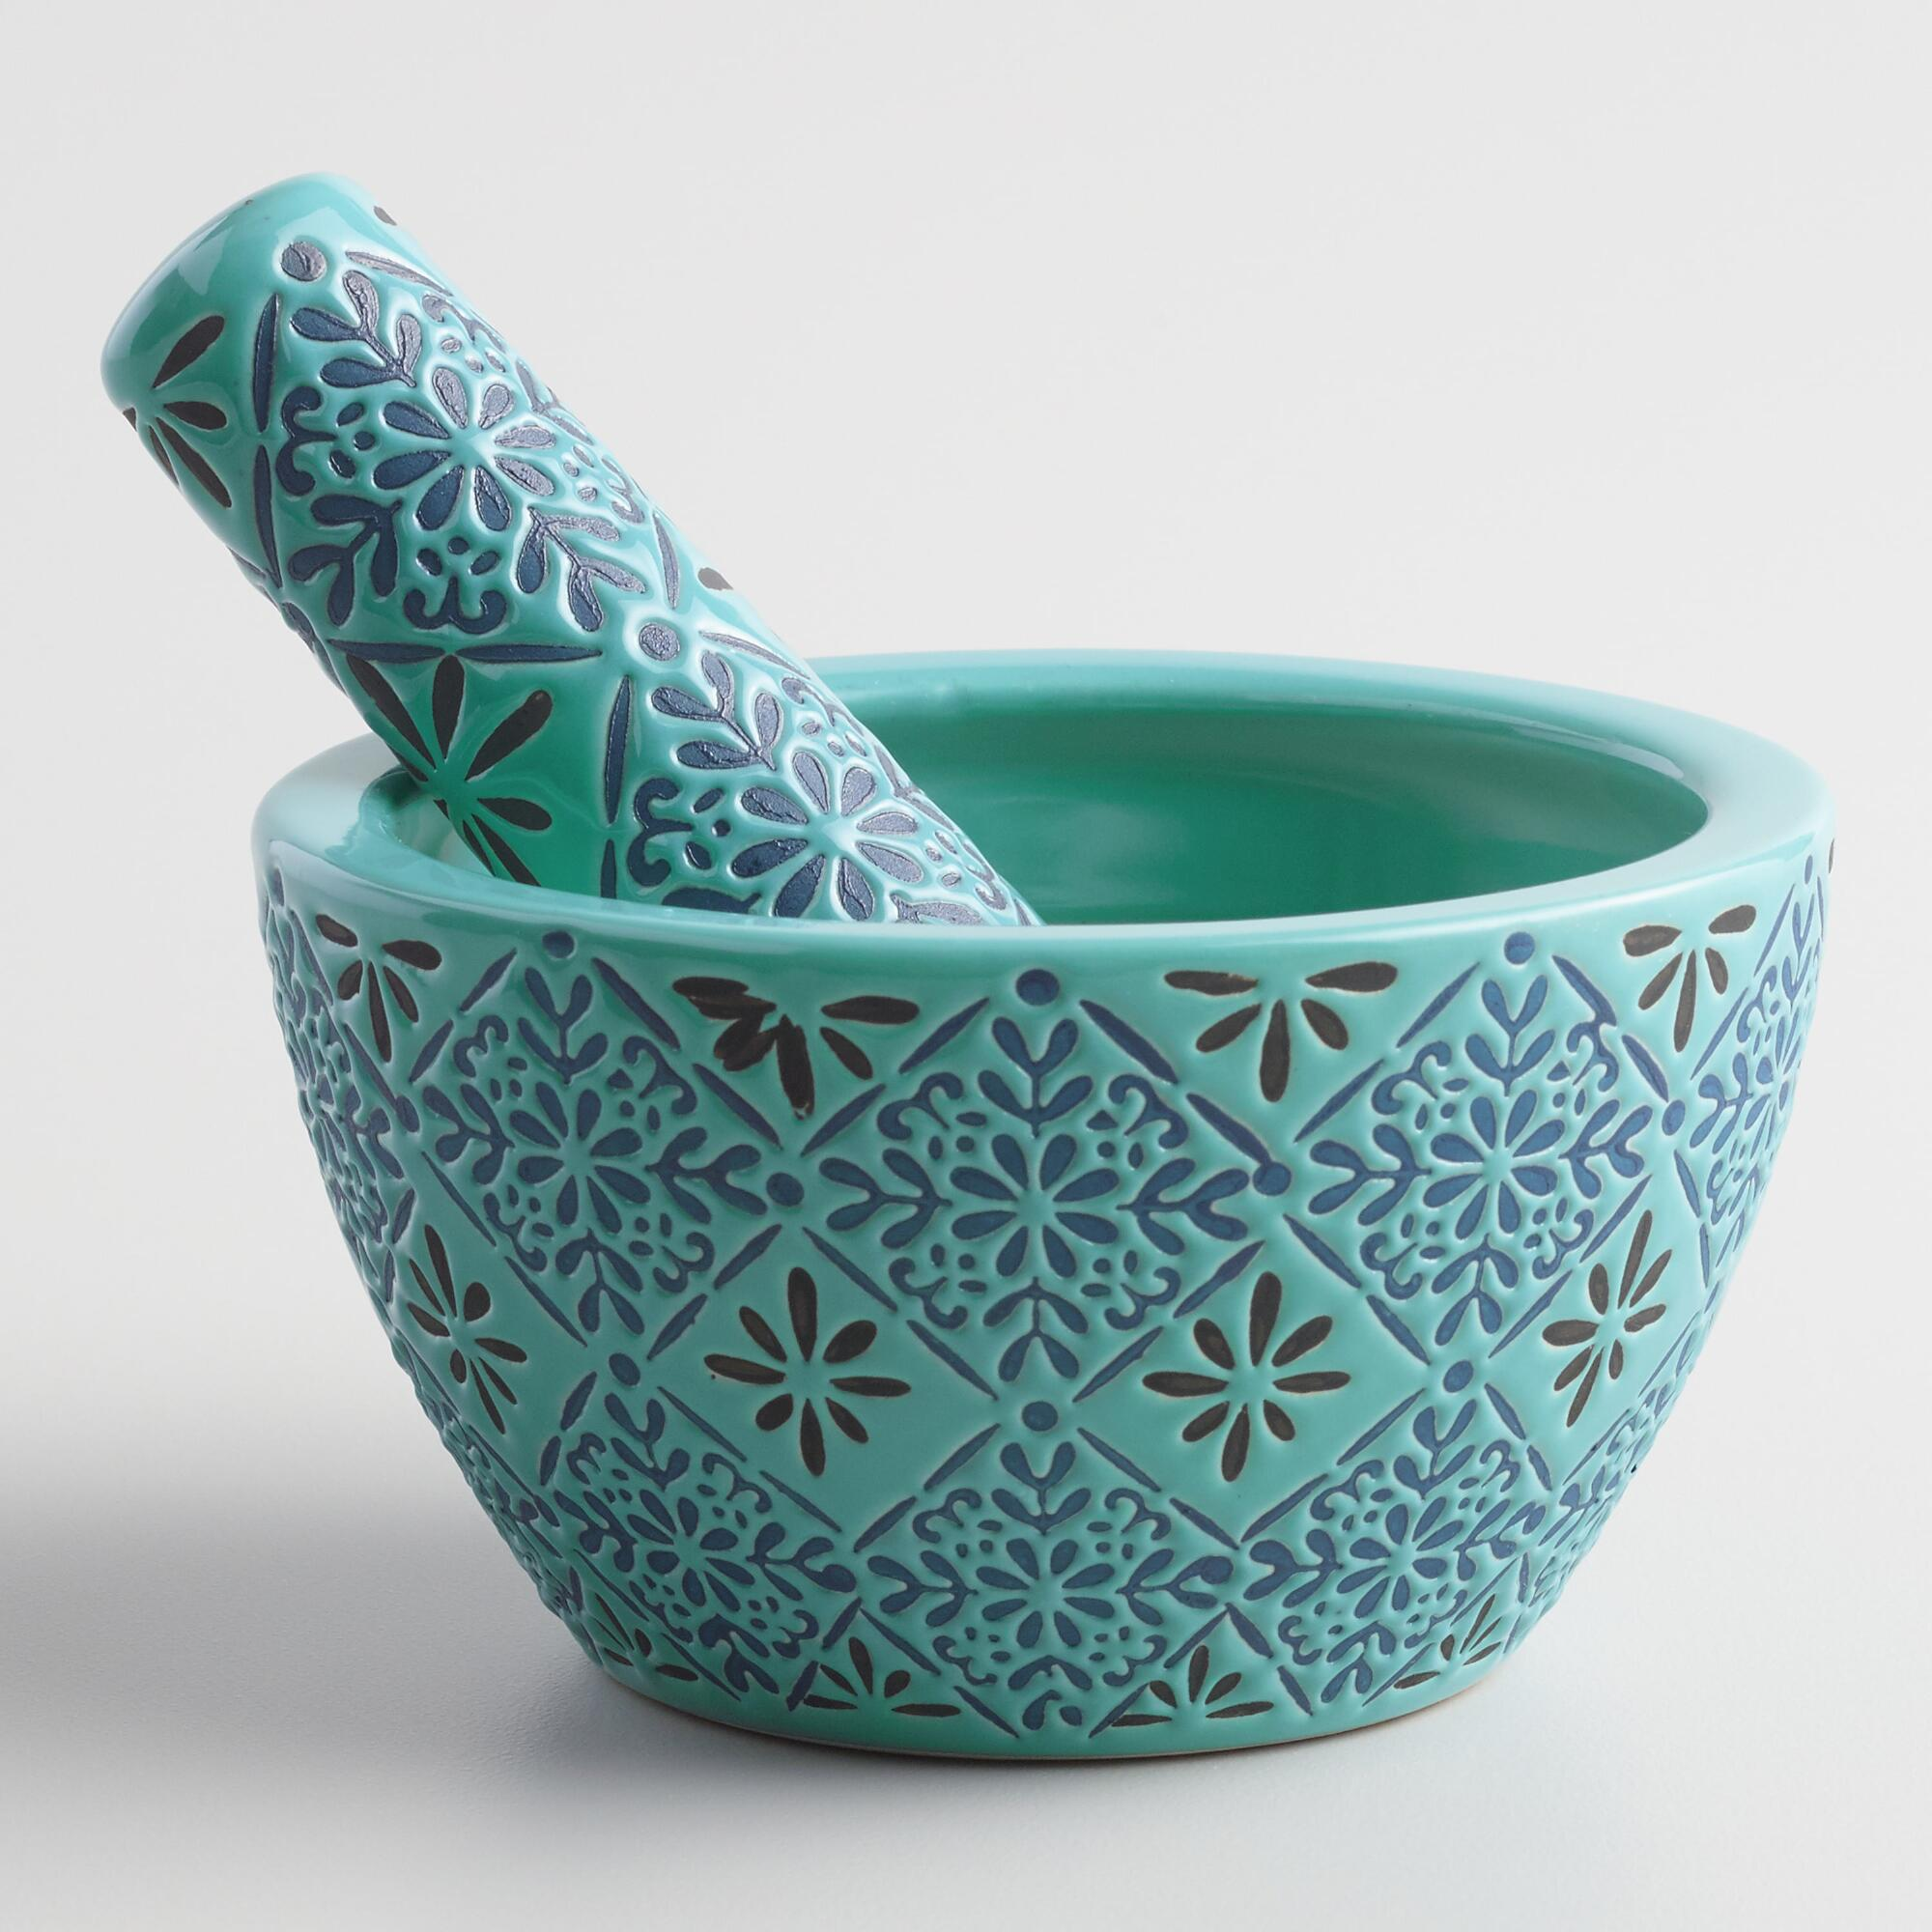 Blue Tile Ceramic Mortar and Pestle